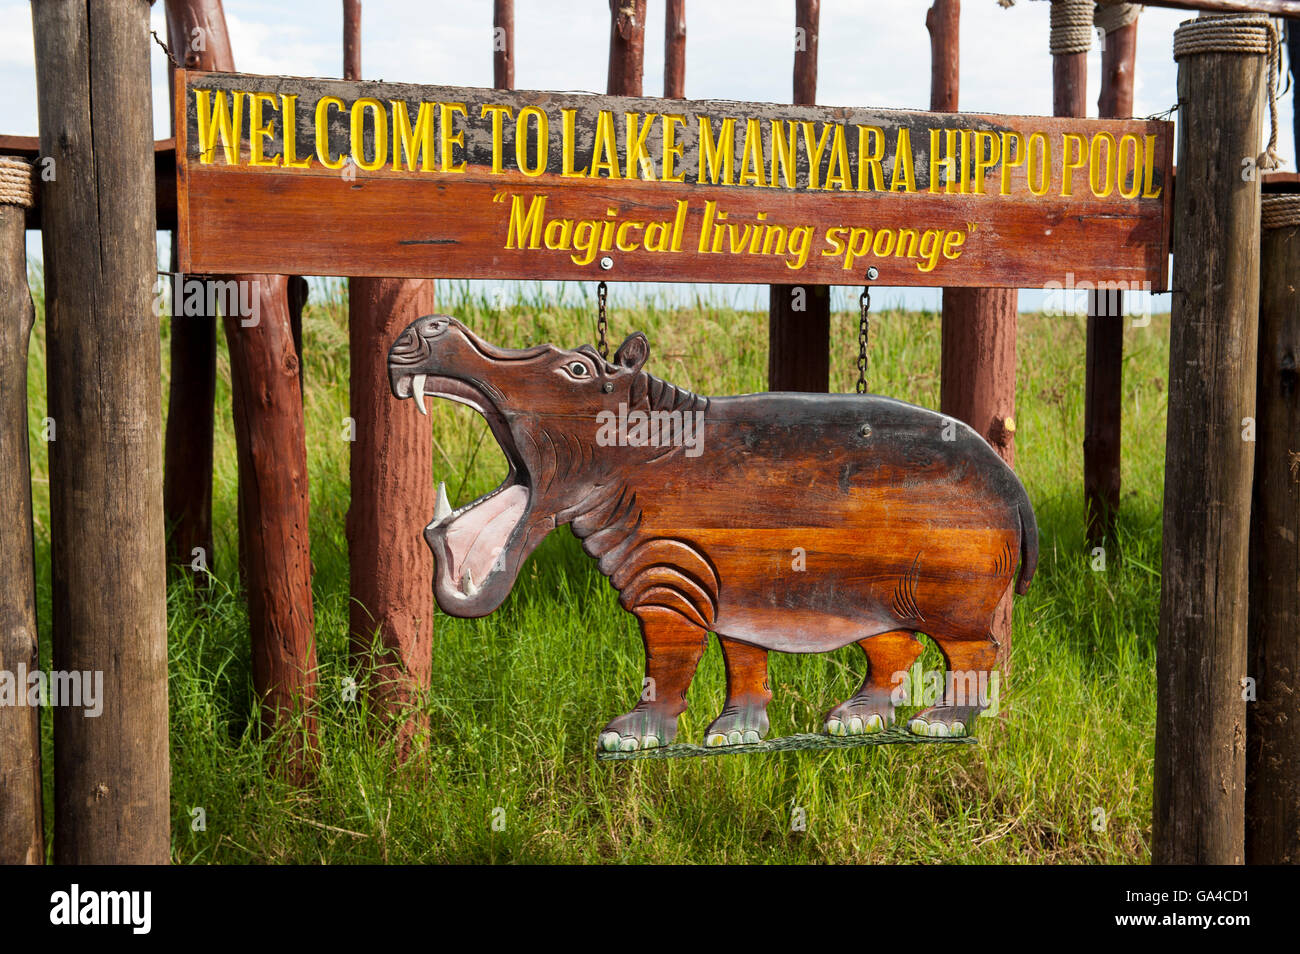 Hippo pool platform, Lake Manyara National Park, Tanzania - Stock Image